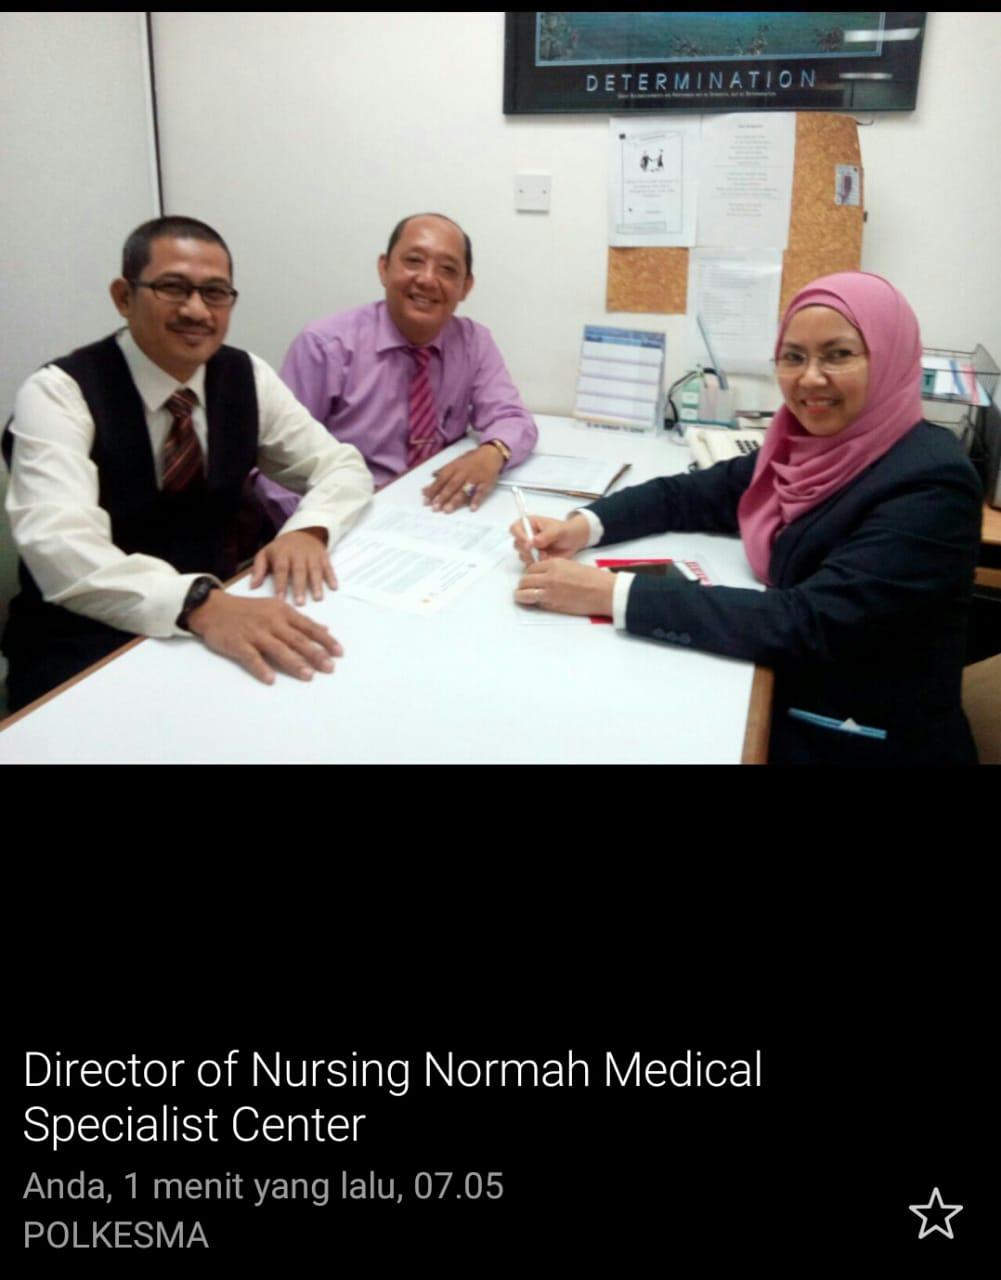 Kegiatan praktik klinik di Normah Medical Specialist Center Malaysia